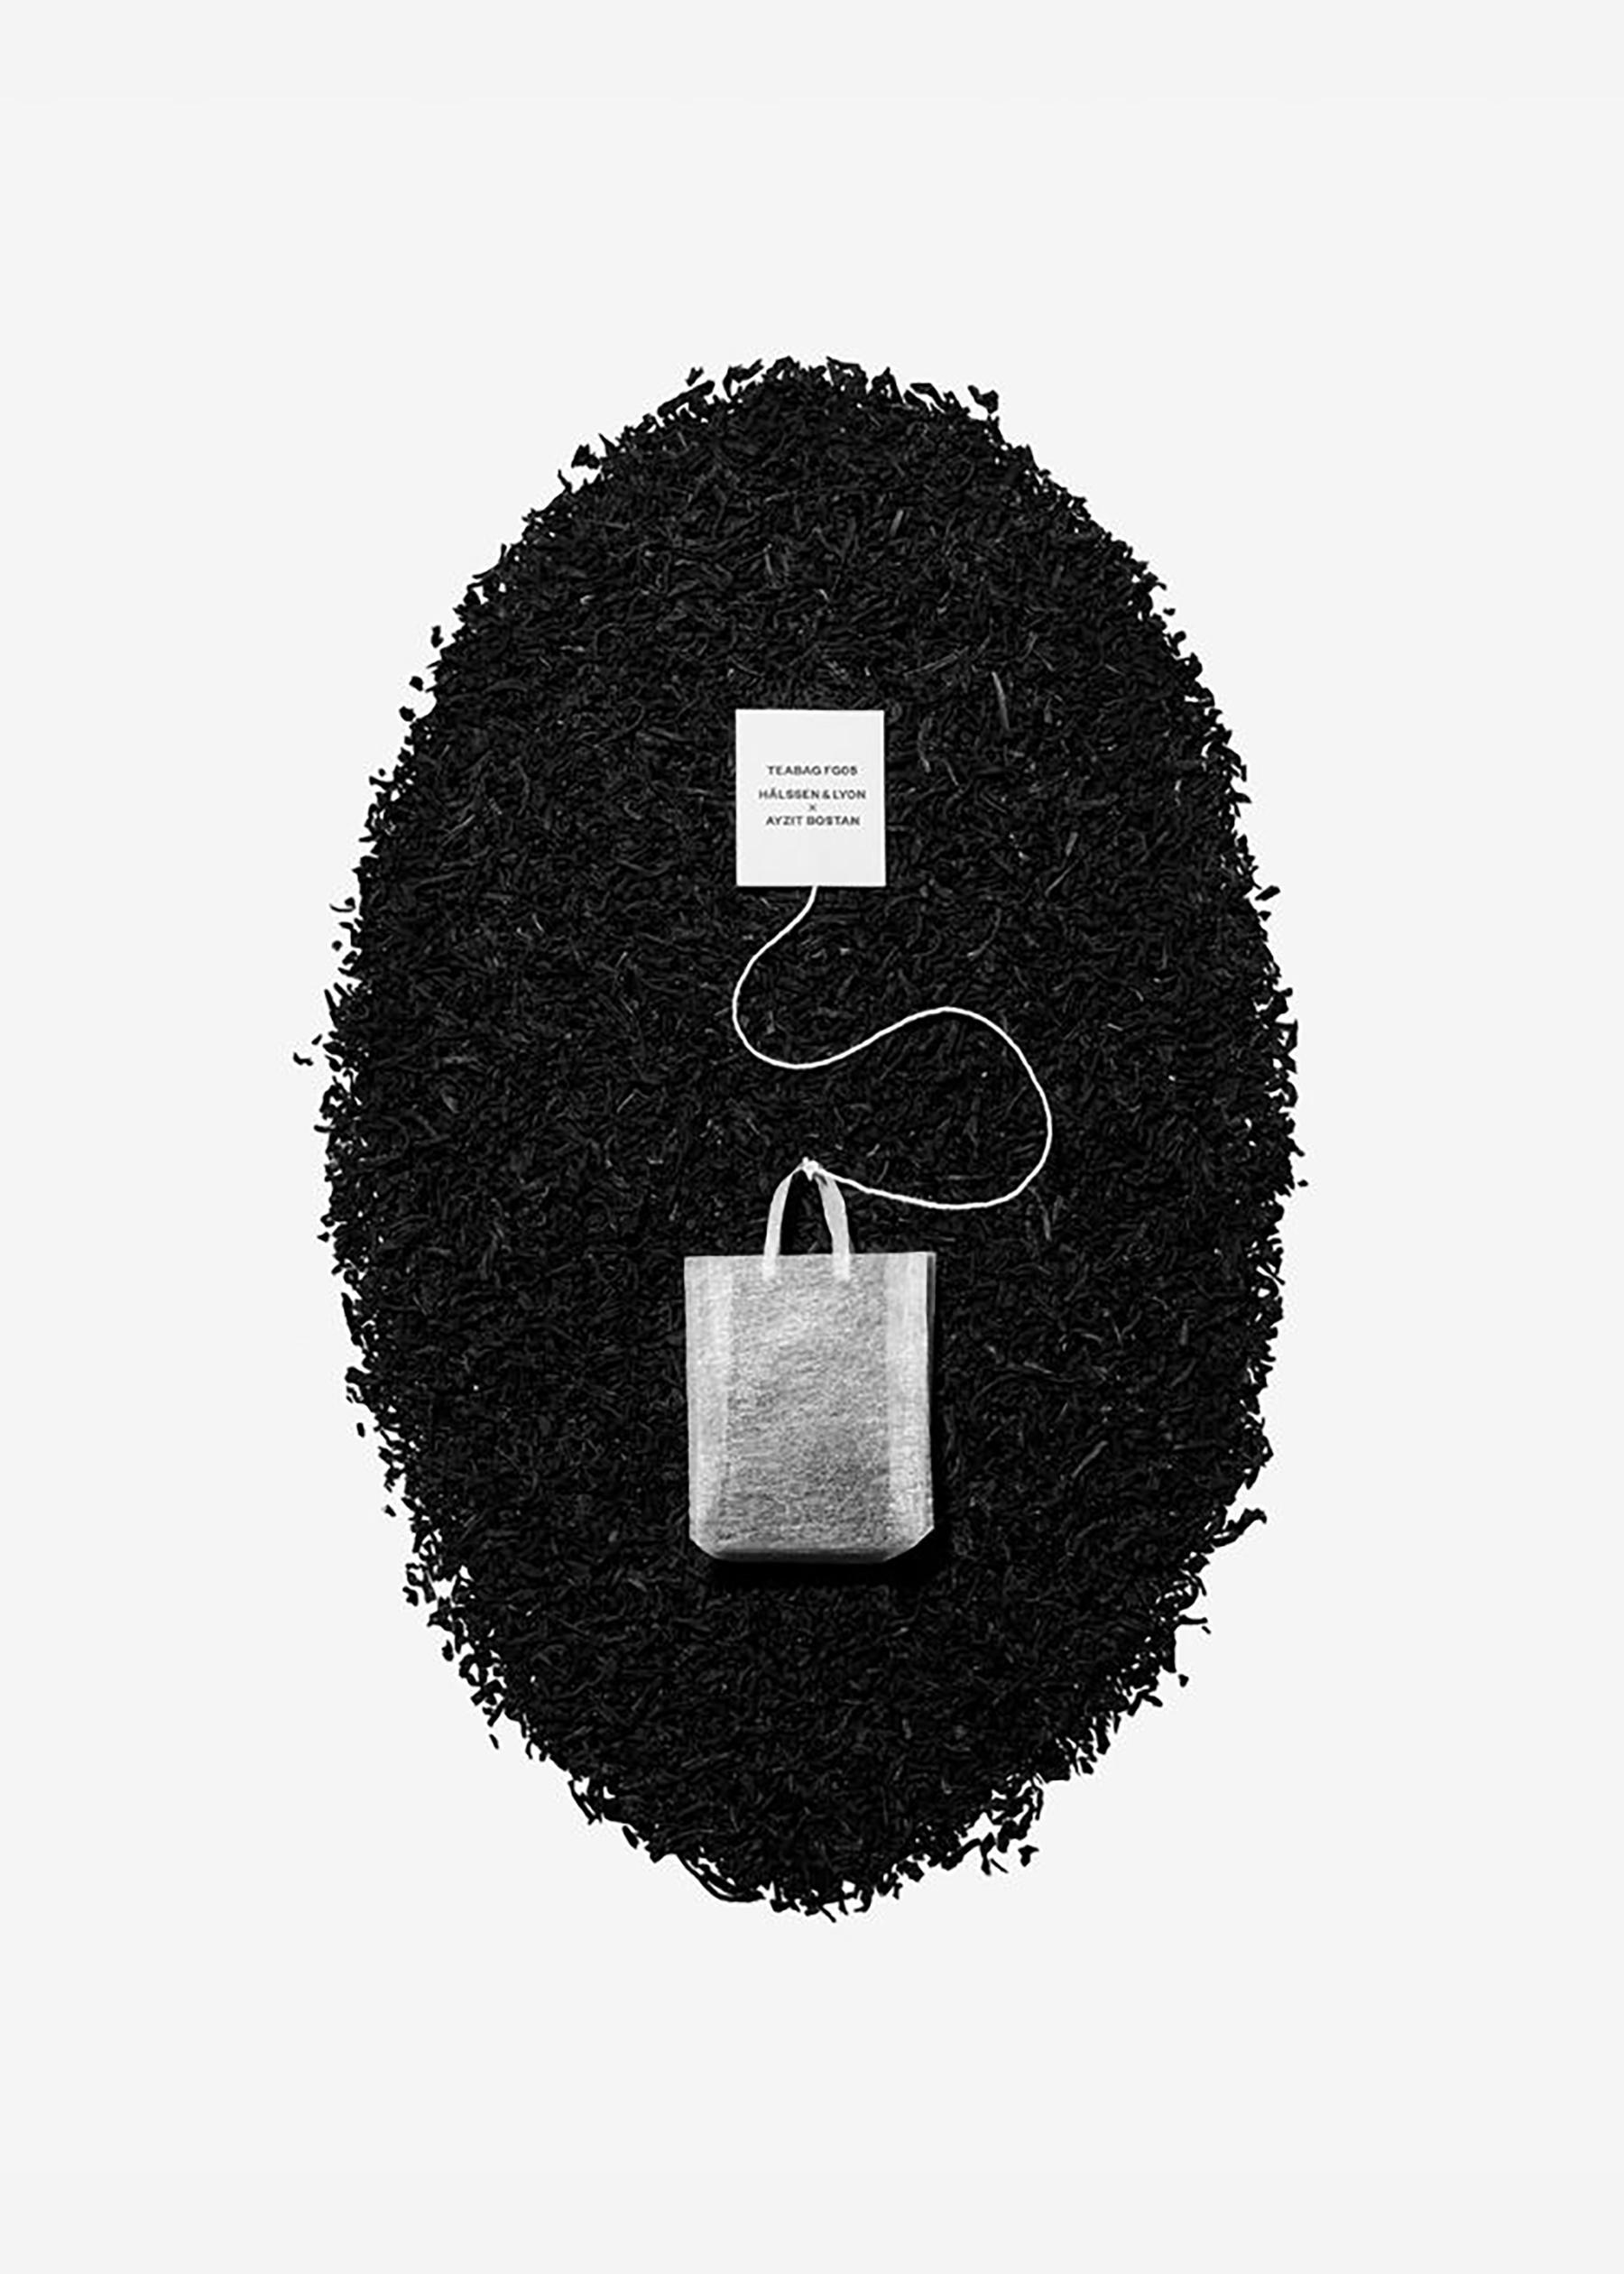 iGNANT-Design-Halssen-&-Lyon-Ayzit-Bostan-The-Teabag-Collection-13